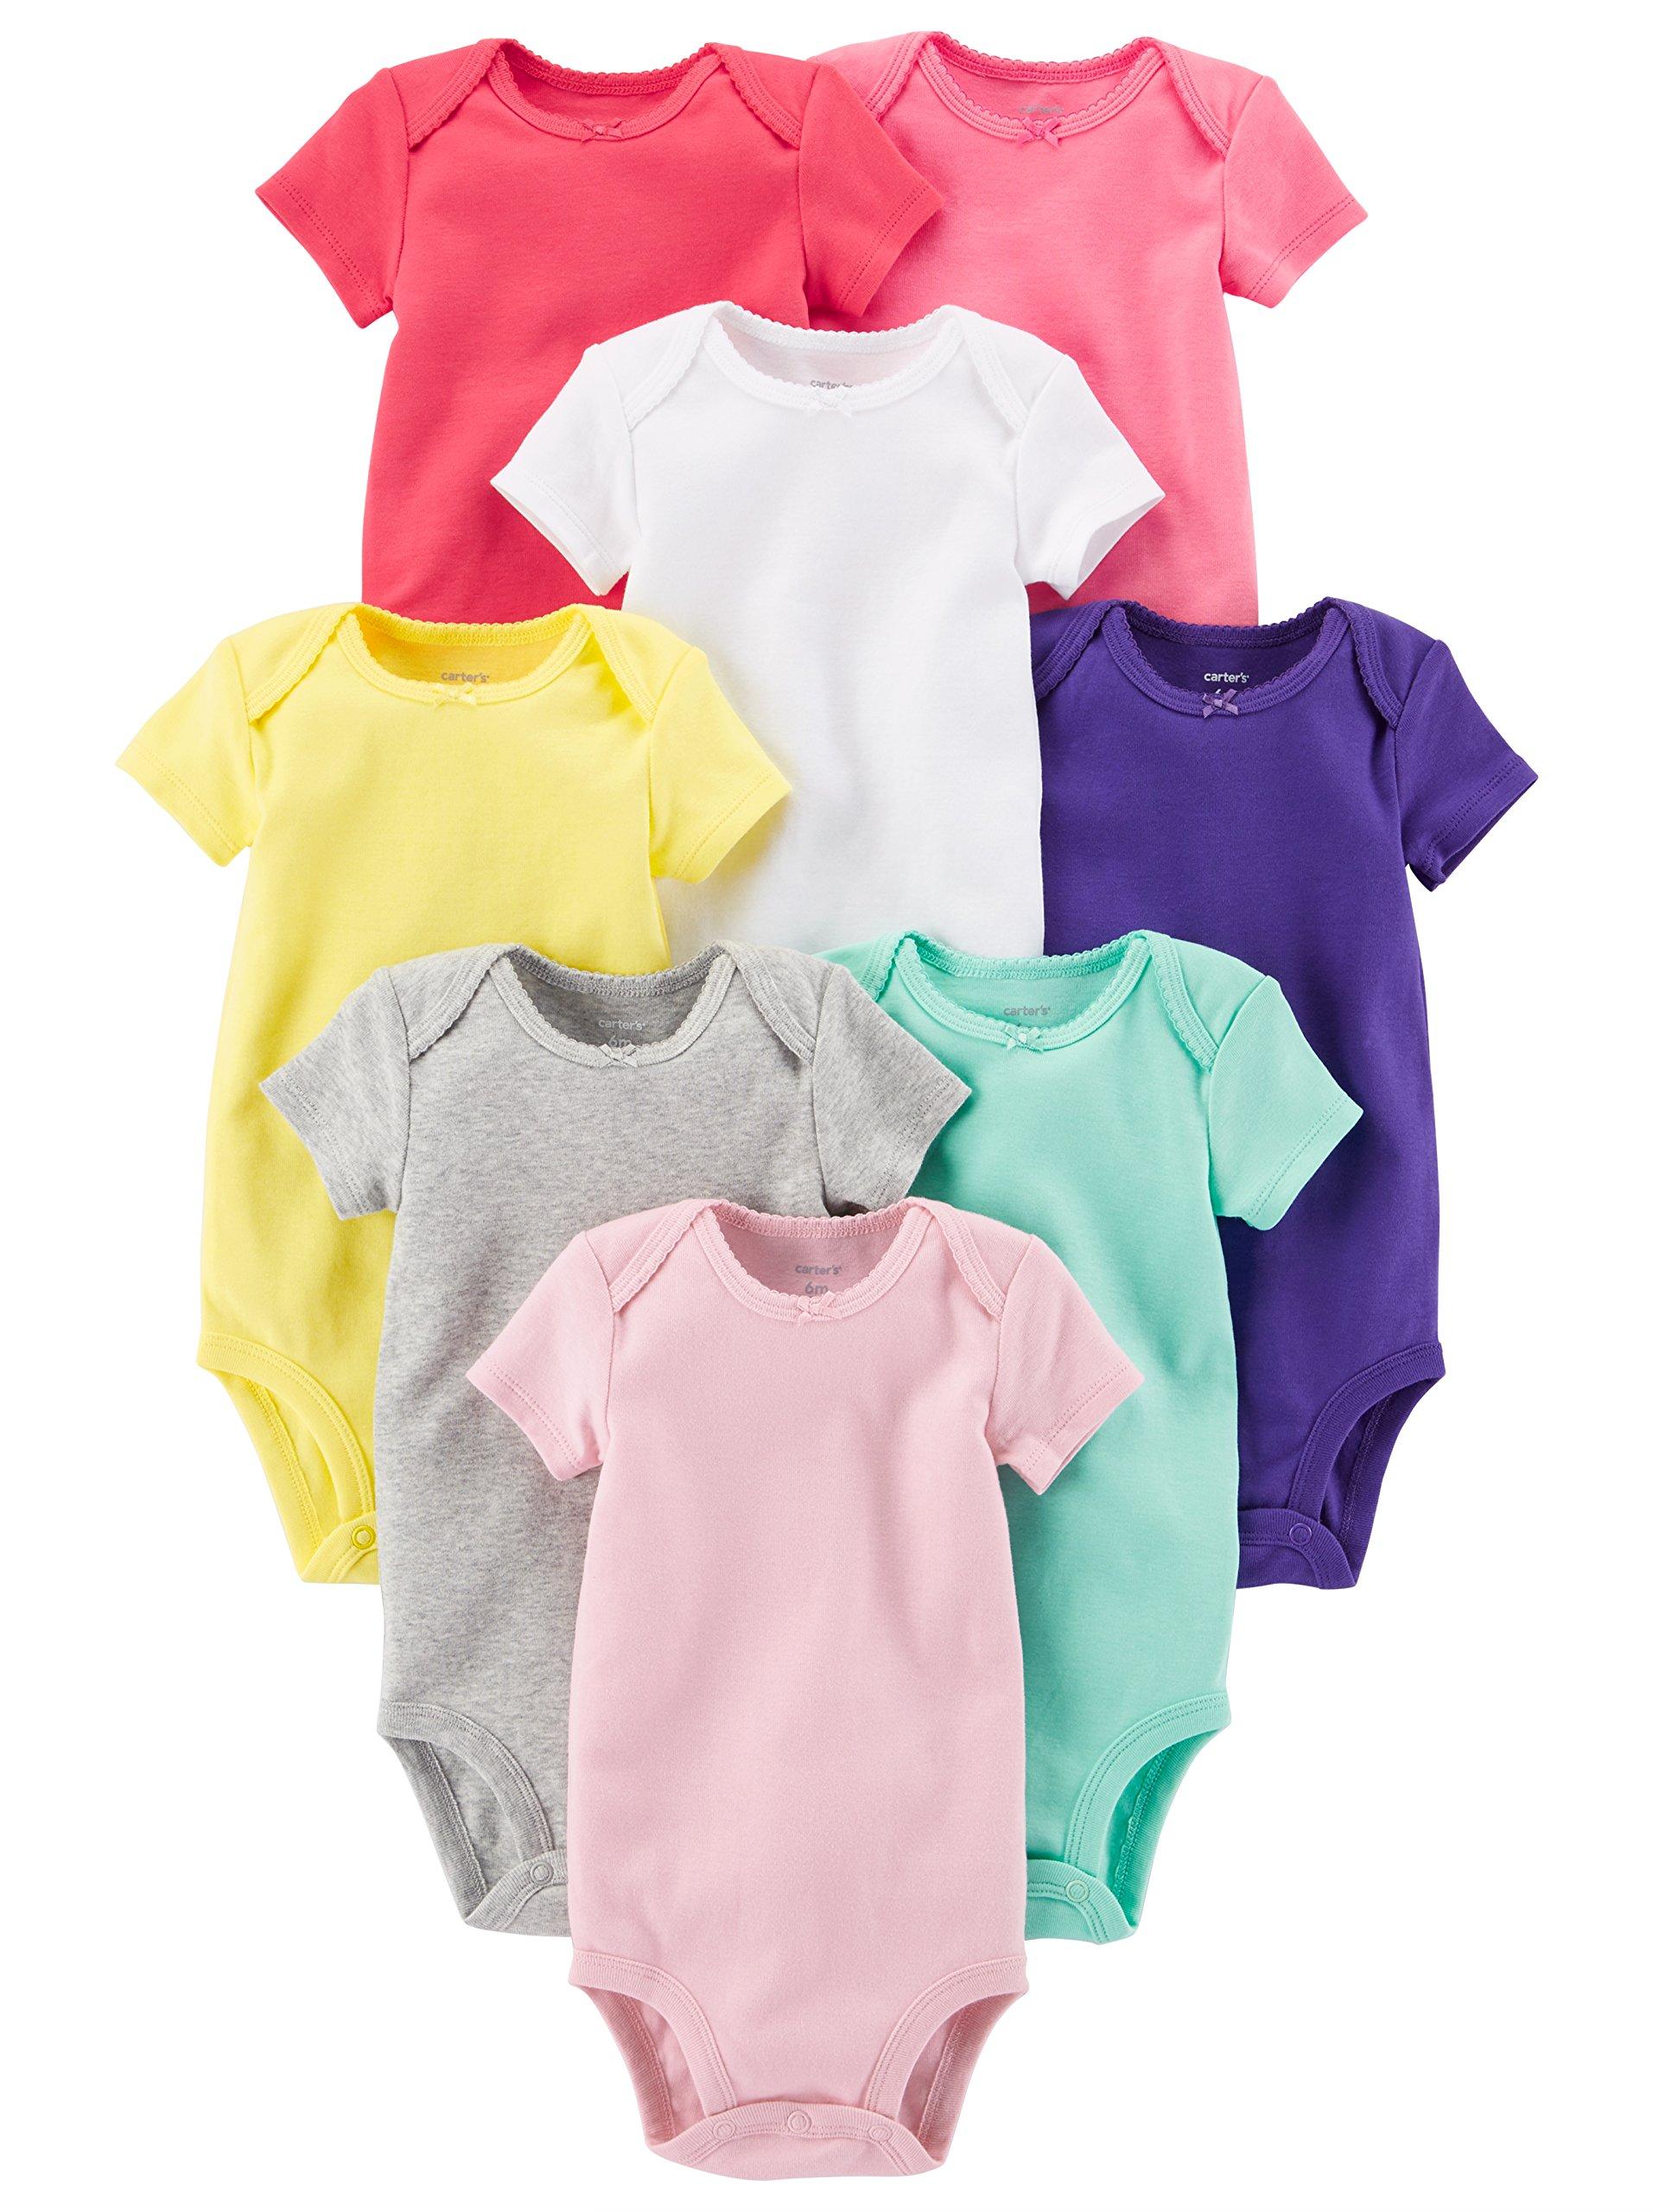 Carter's Baby Girls' 8 Pack Short Sleeve Bodysuits, Multi/Pink, 3 Months